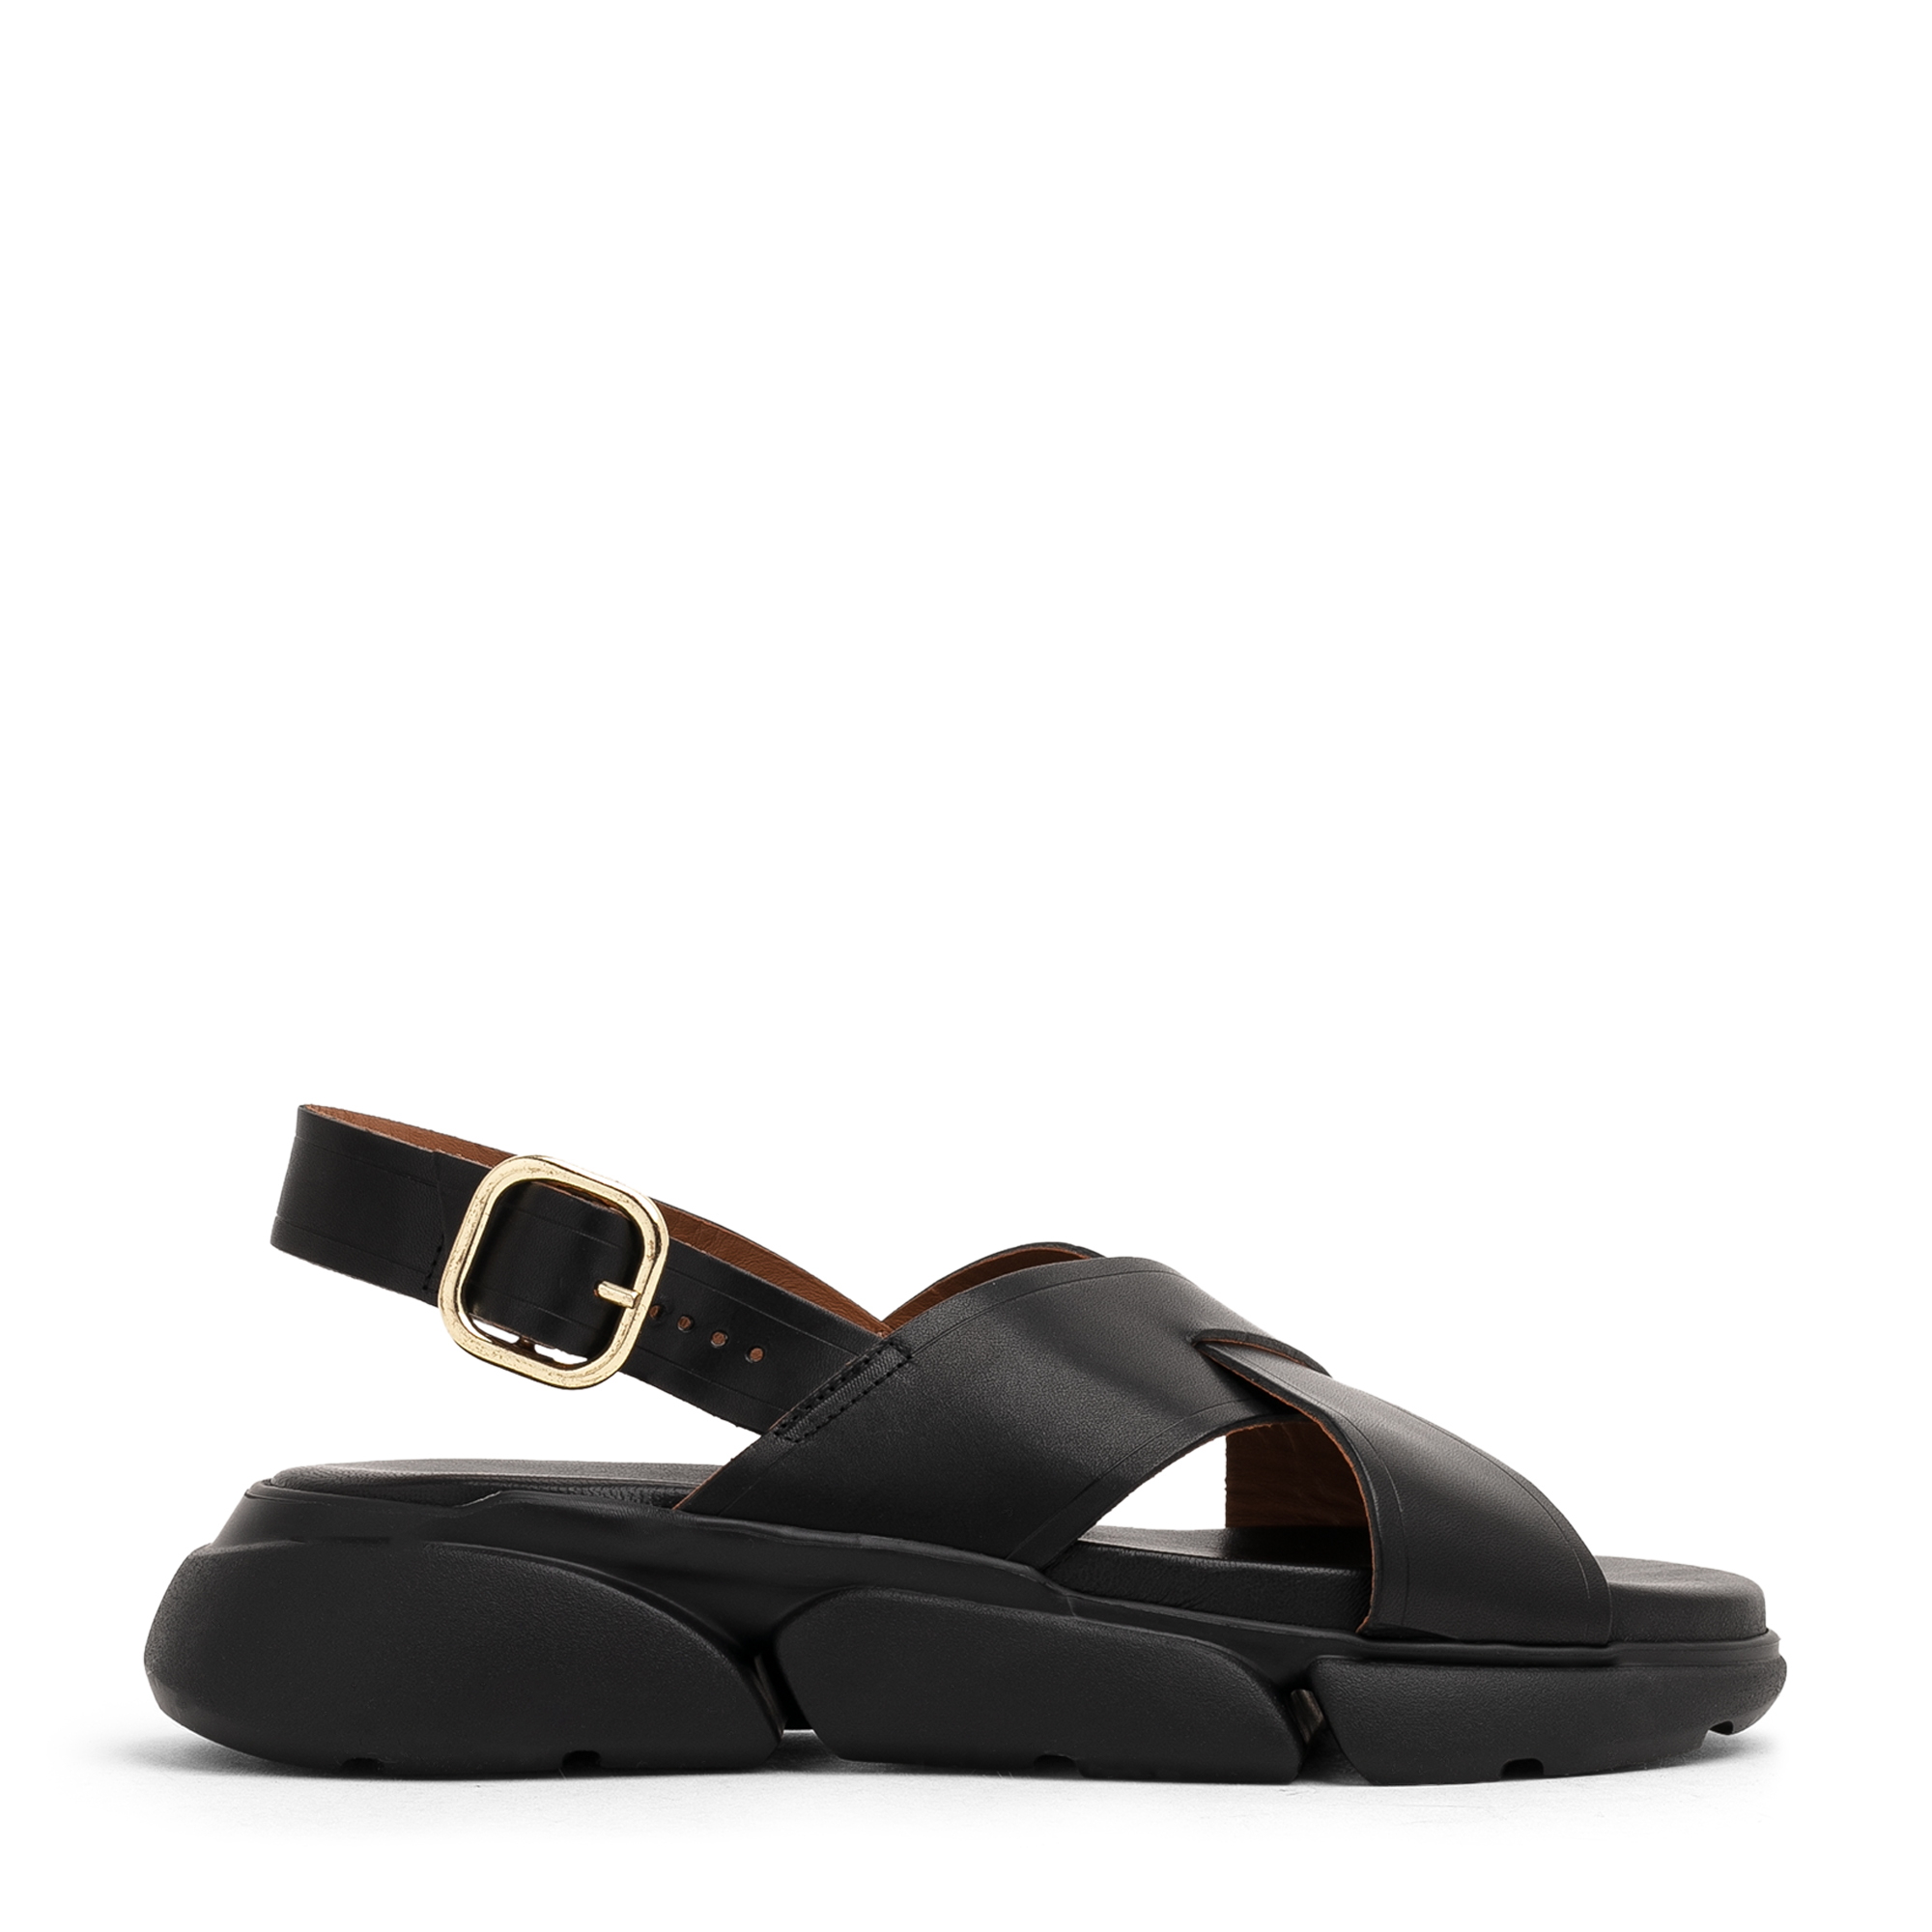 Barisci chunky sandals